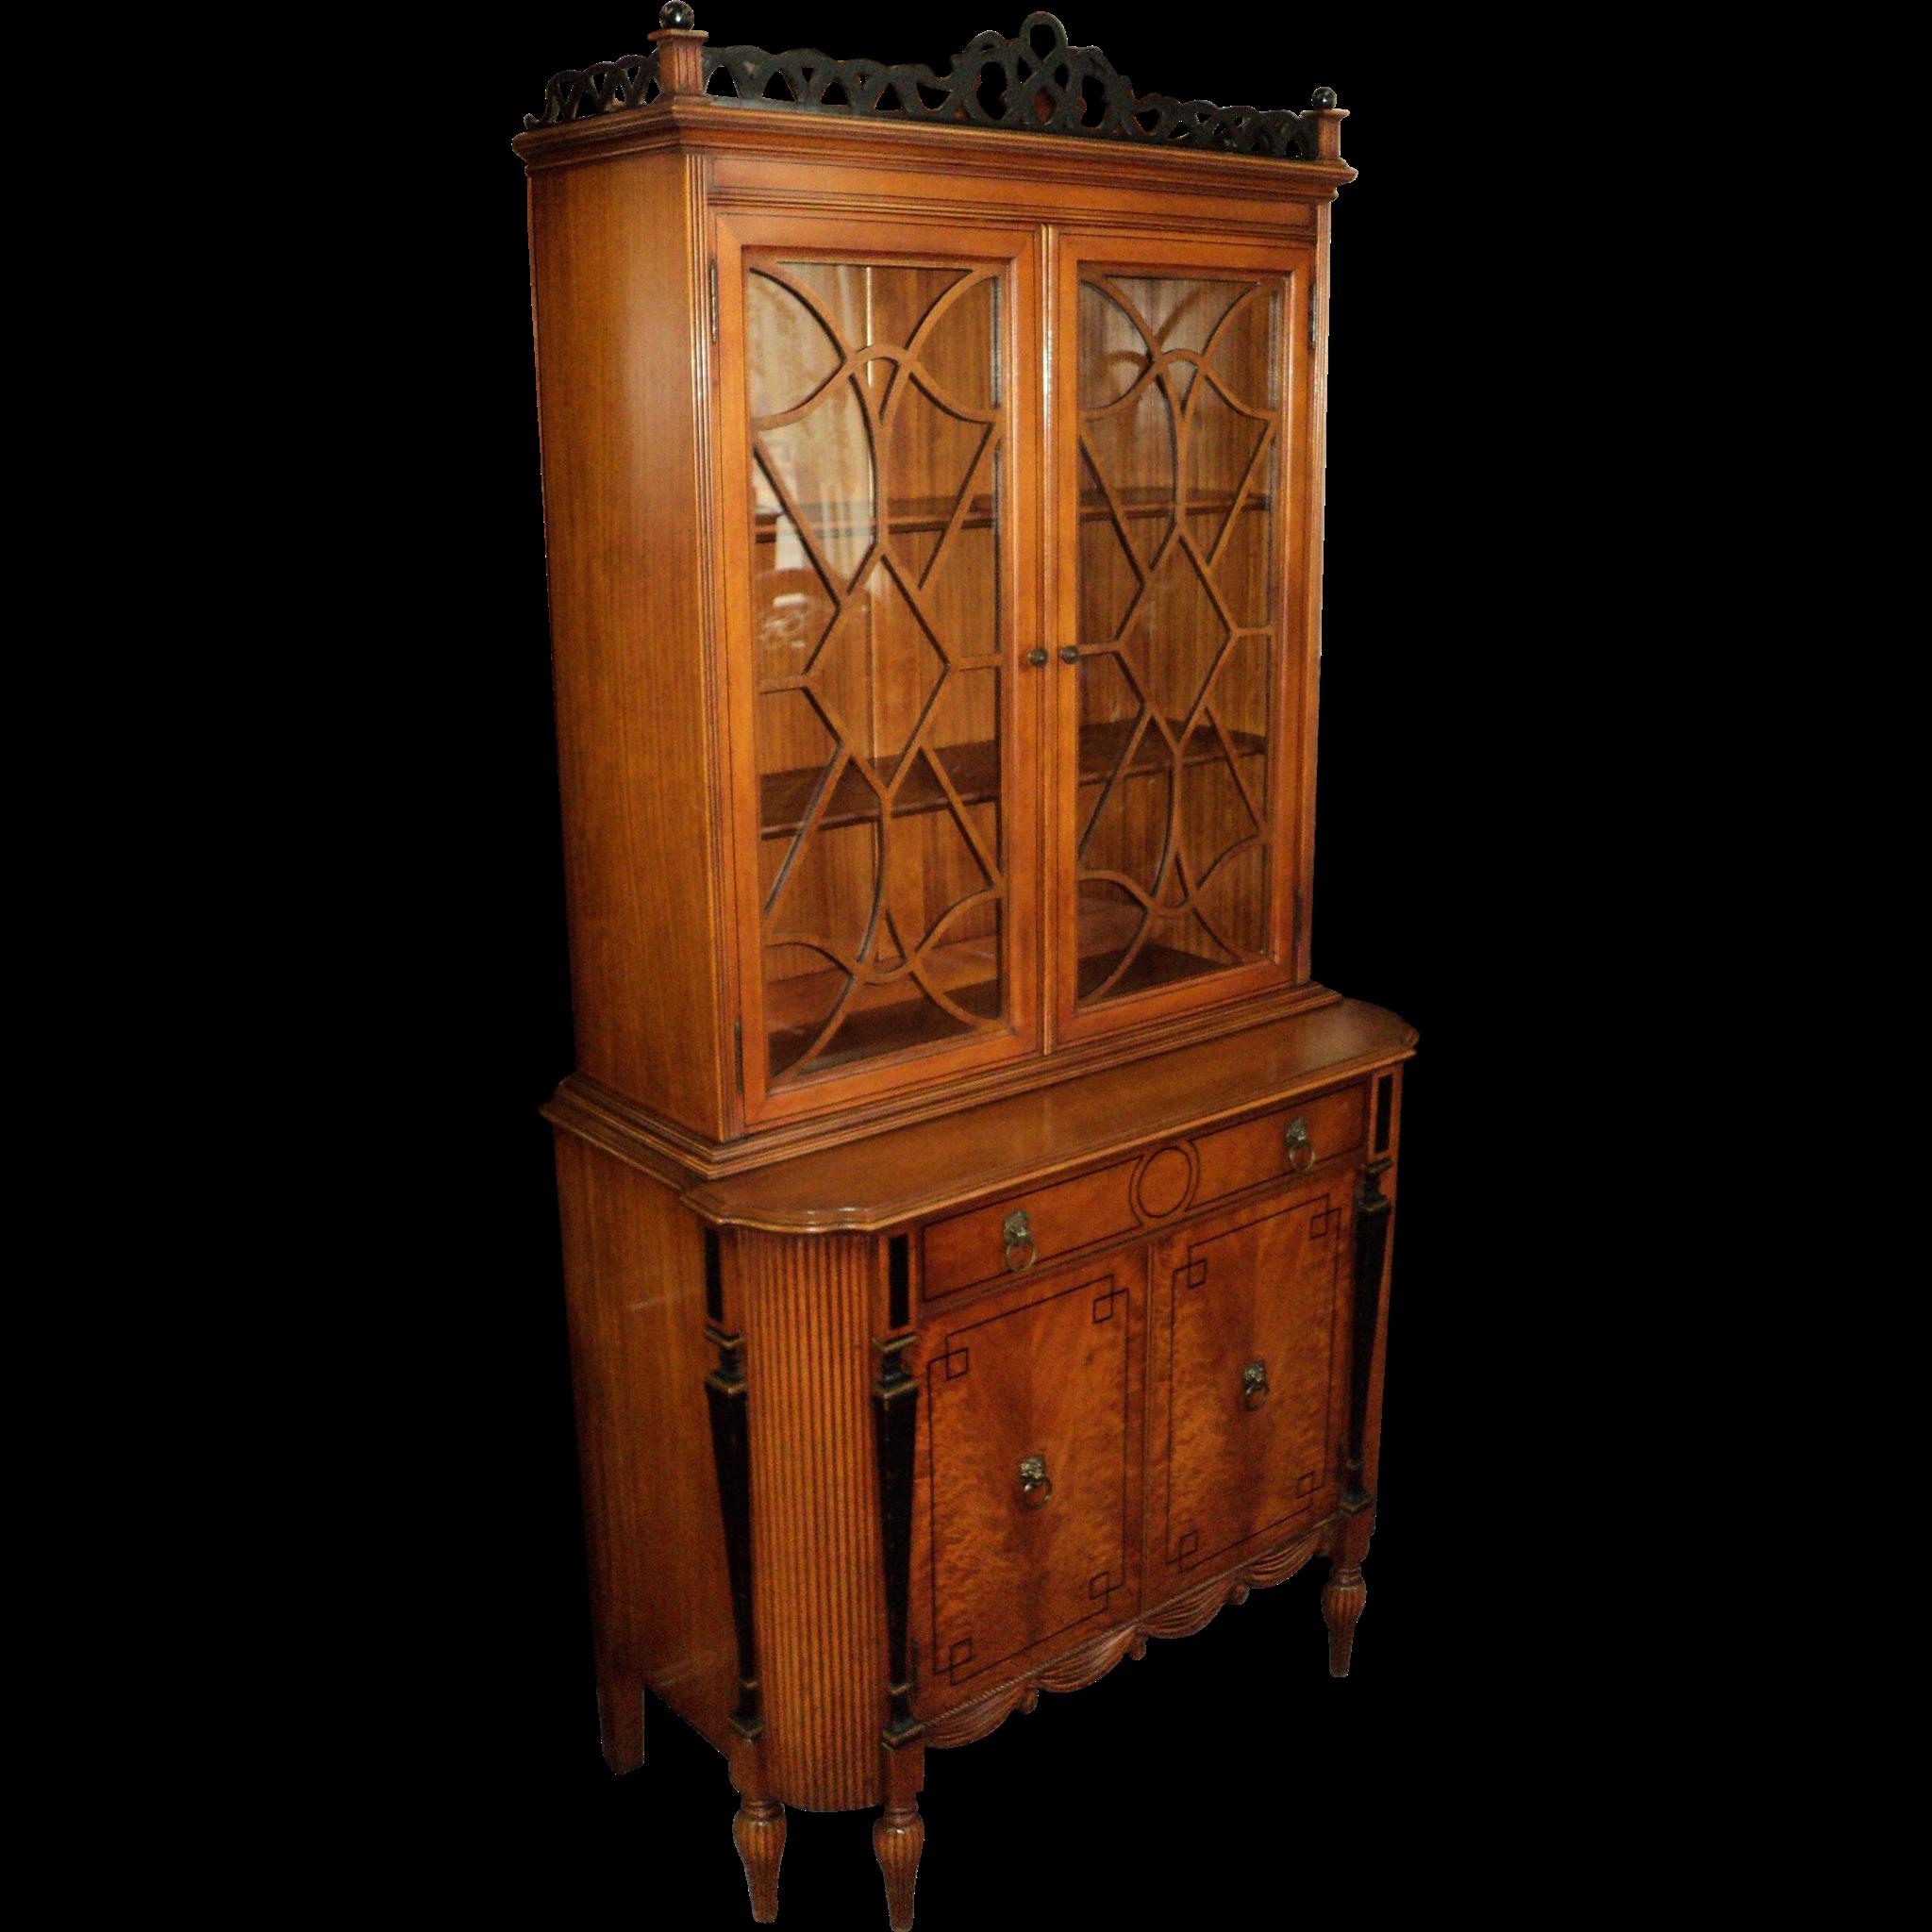 Satin Wood Sheraton Style 1930's China Cabinet